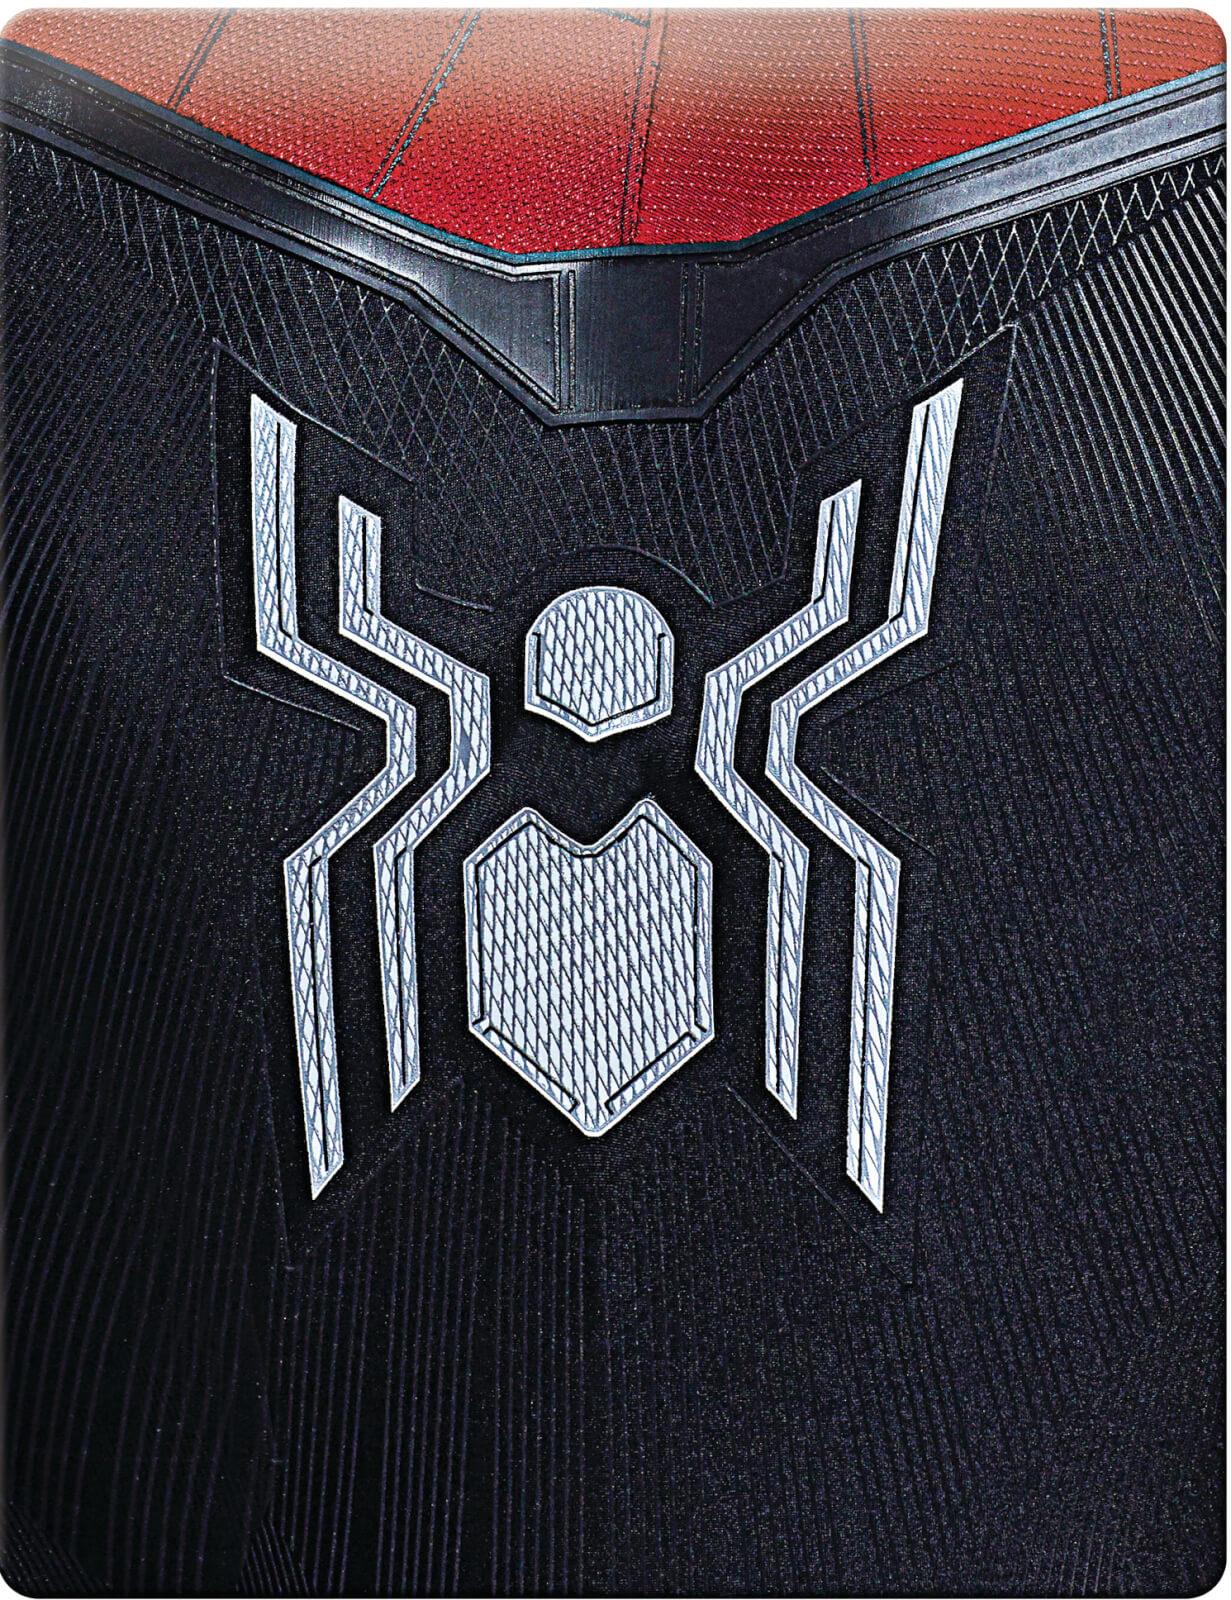 Spider-man-Far-From-Home-steelbook-zavvi-2.jpg